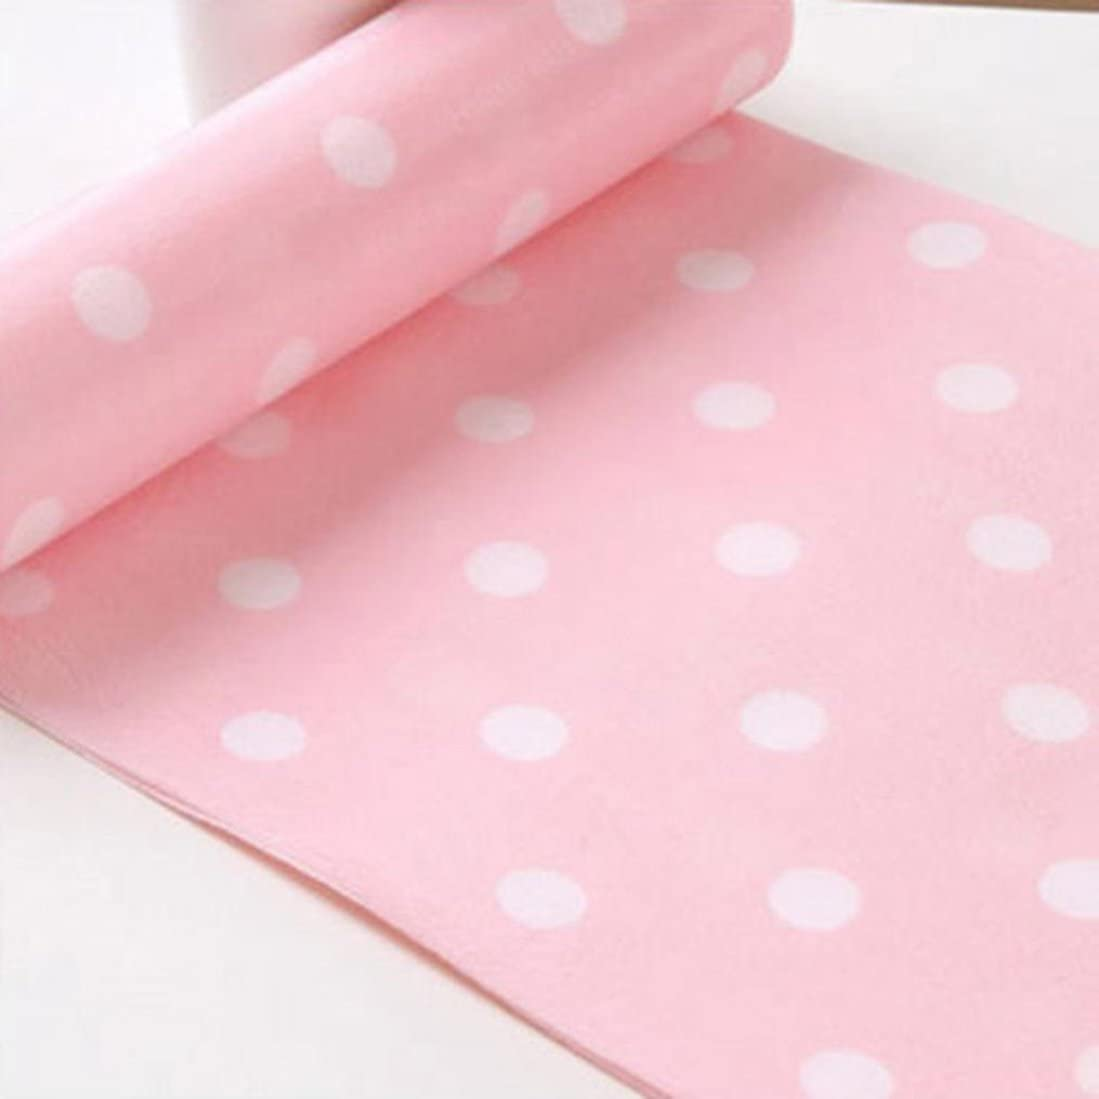 E 30*300cm saihui 3/m mesa de cocina caj/ón estante maletero papel de contacto impermeable Mat Pad no Slid